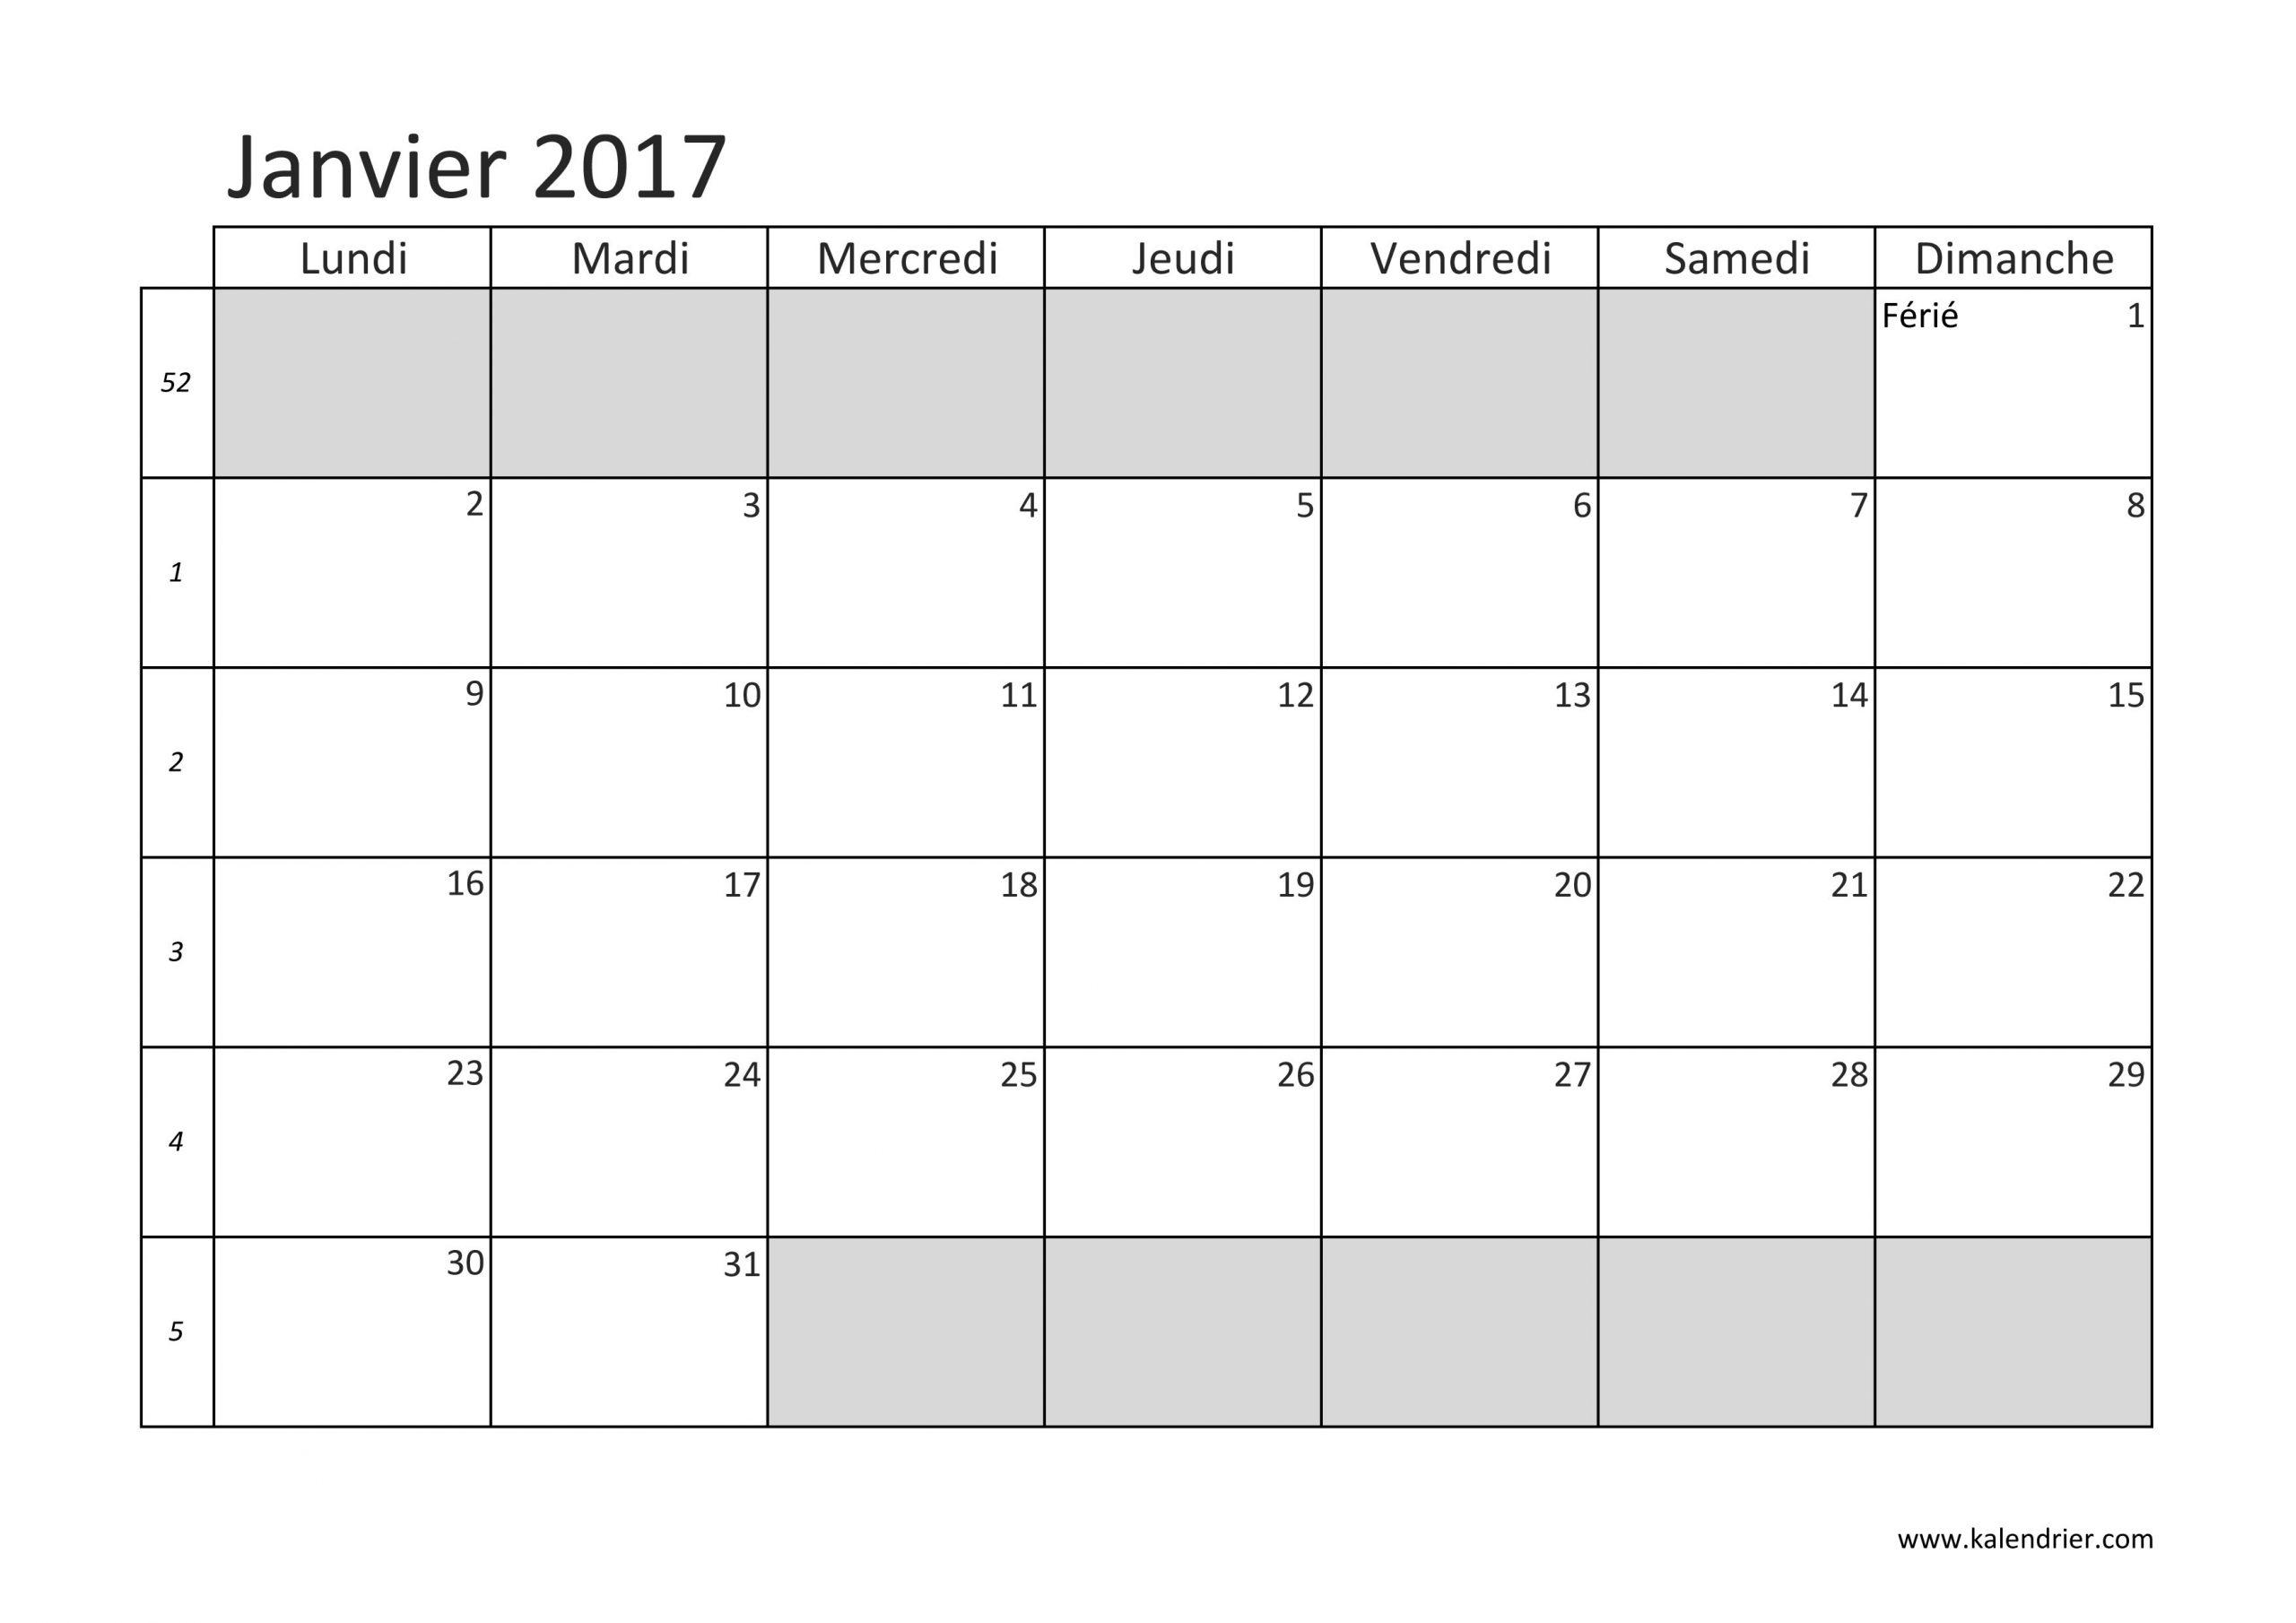 Imprimer Calendrier 2017 Gratuitement - Pdf, Xls Et Jpg serapportantà Calendrier Mars 2018 À Imprimer